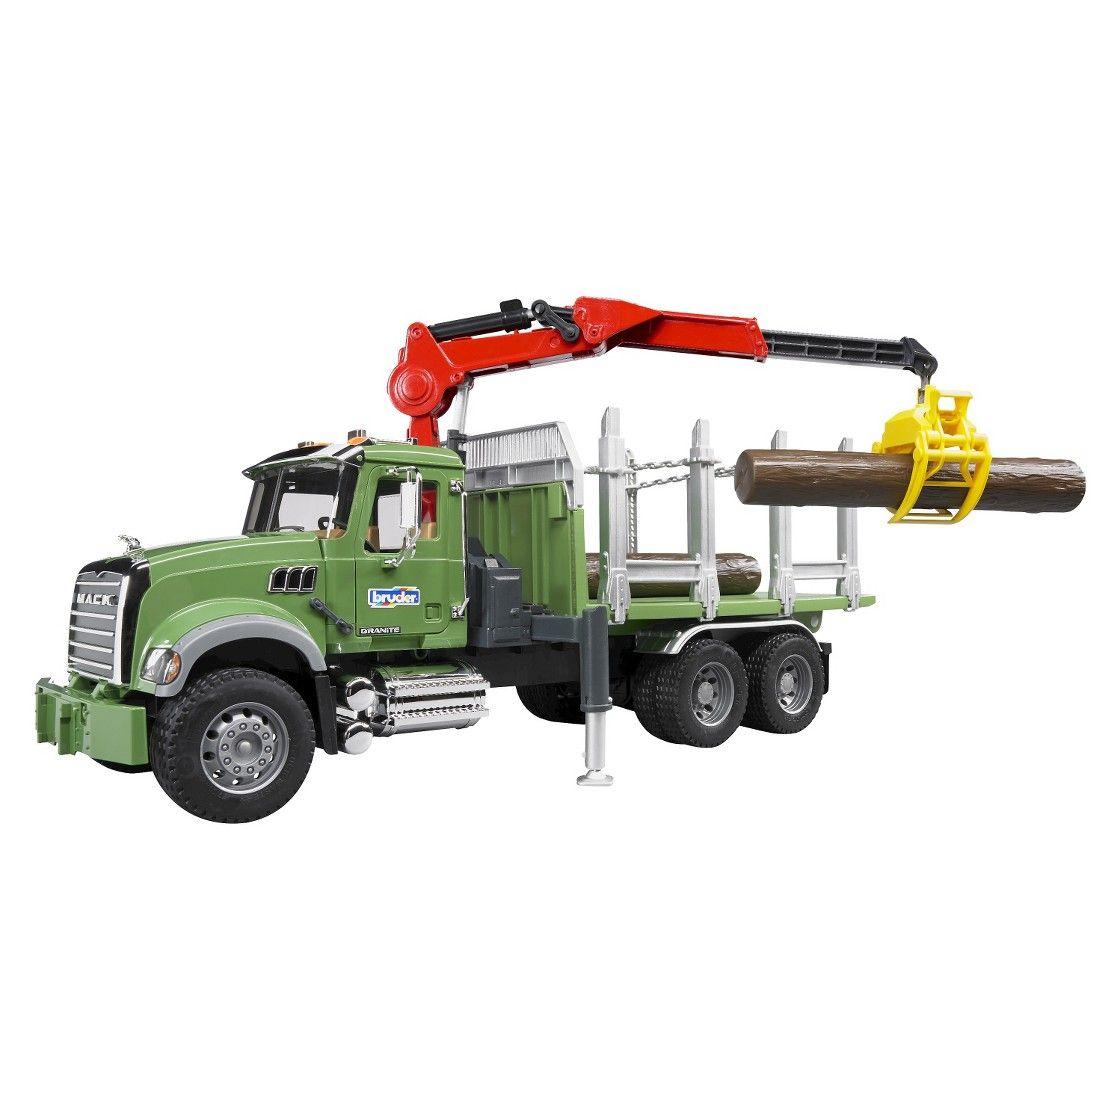 Bruder Mack Granite Timber Truck With Loading Crane And 3 Logs Trucks Toy Trucks Mack